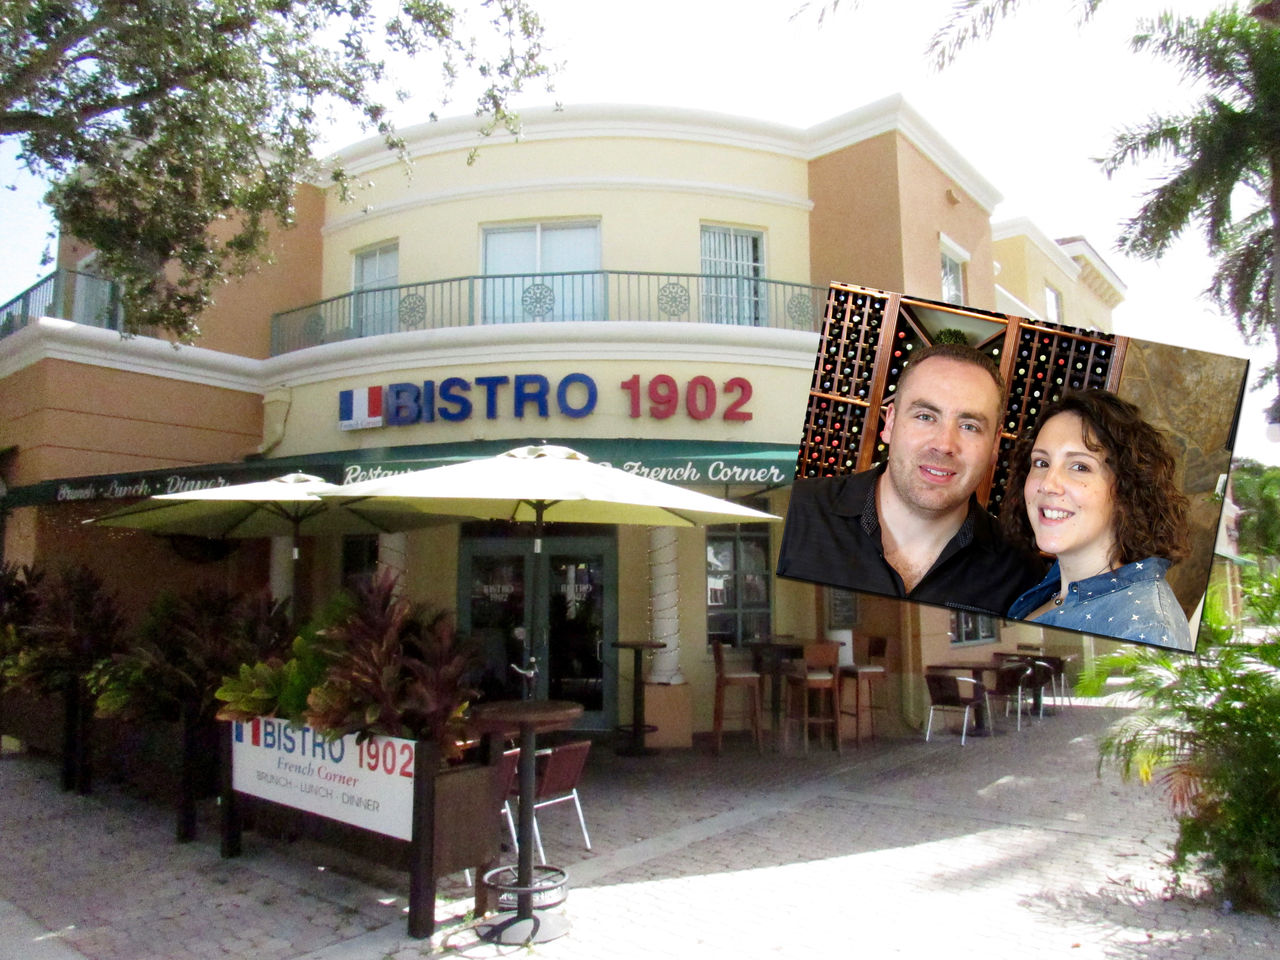 Bistro 1902, restaurant français sur Hollywood blvd, à Hollywood en Floride